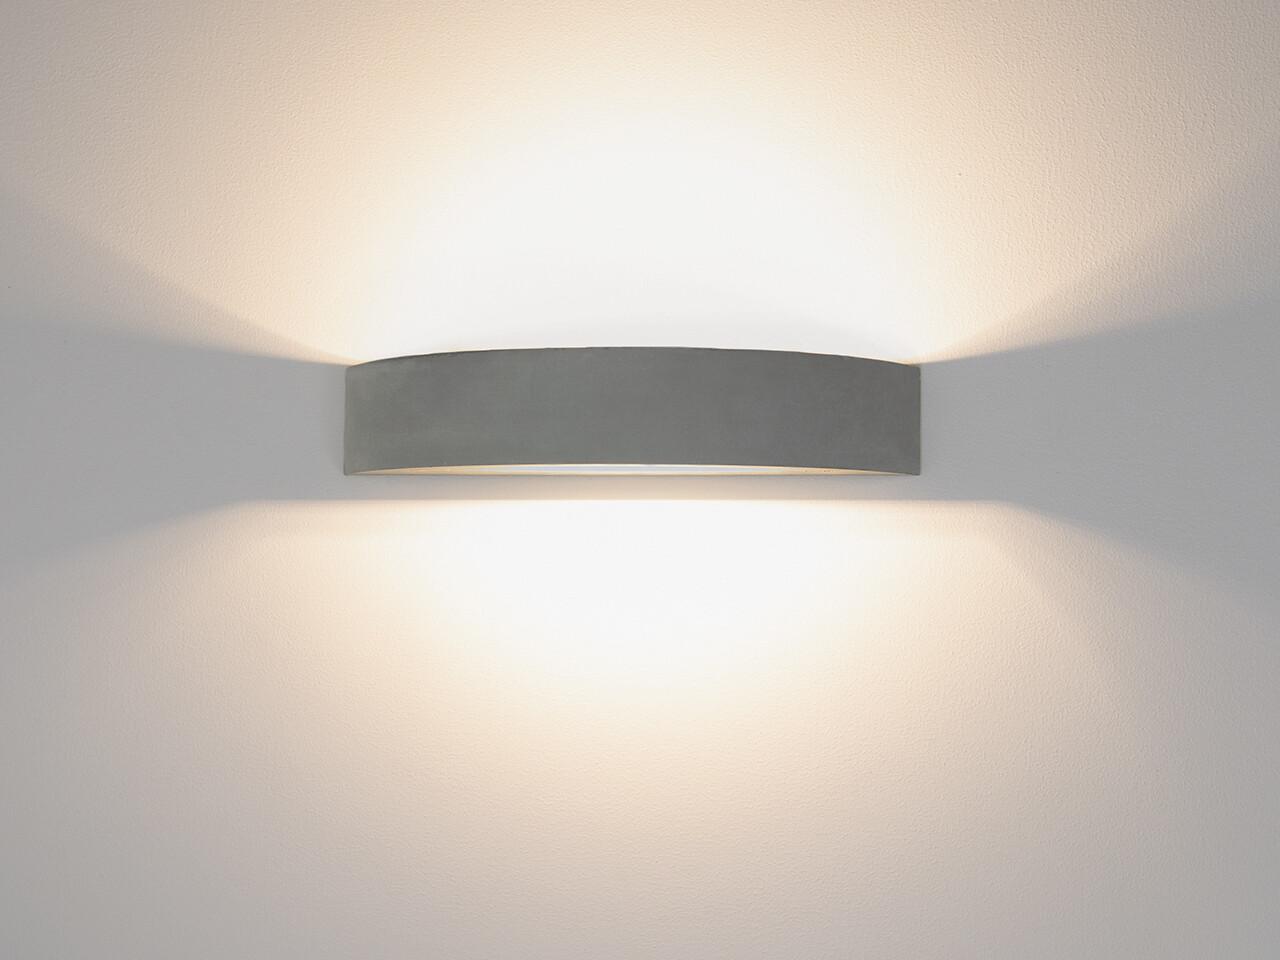 9010 Wandleuchte 1095B LED 10W, IP65, Corten